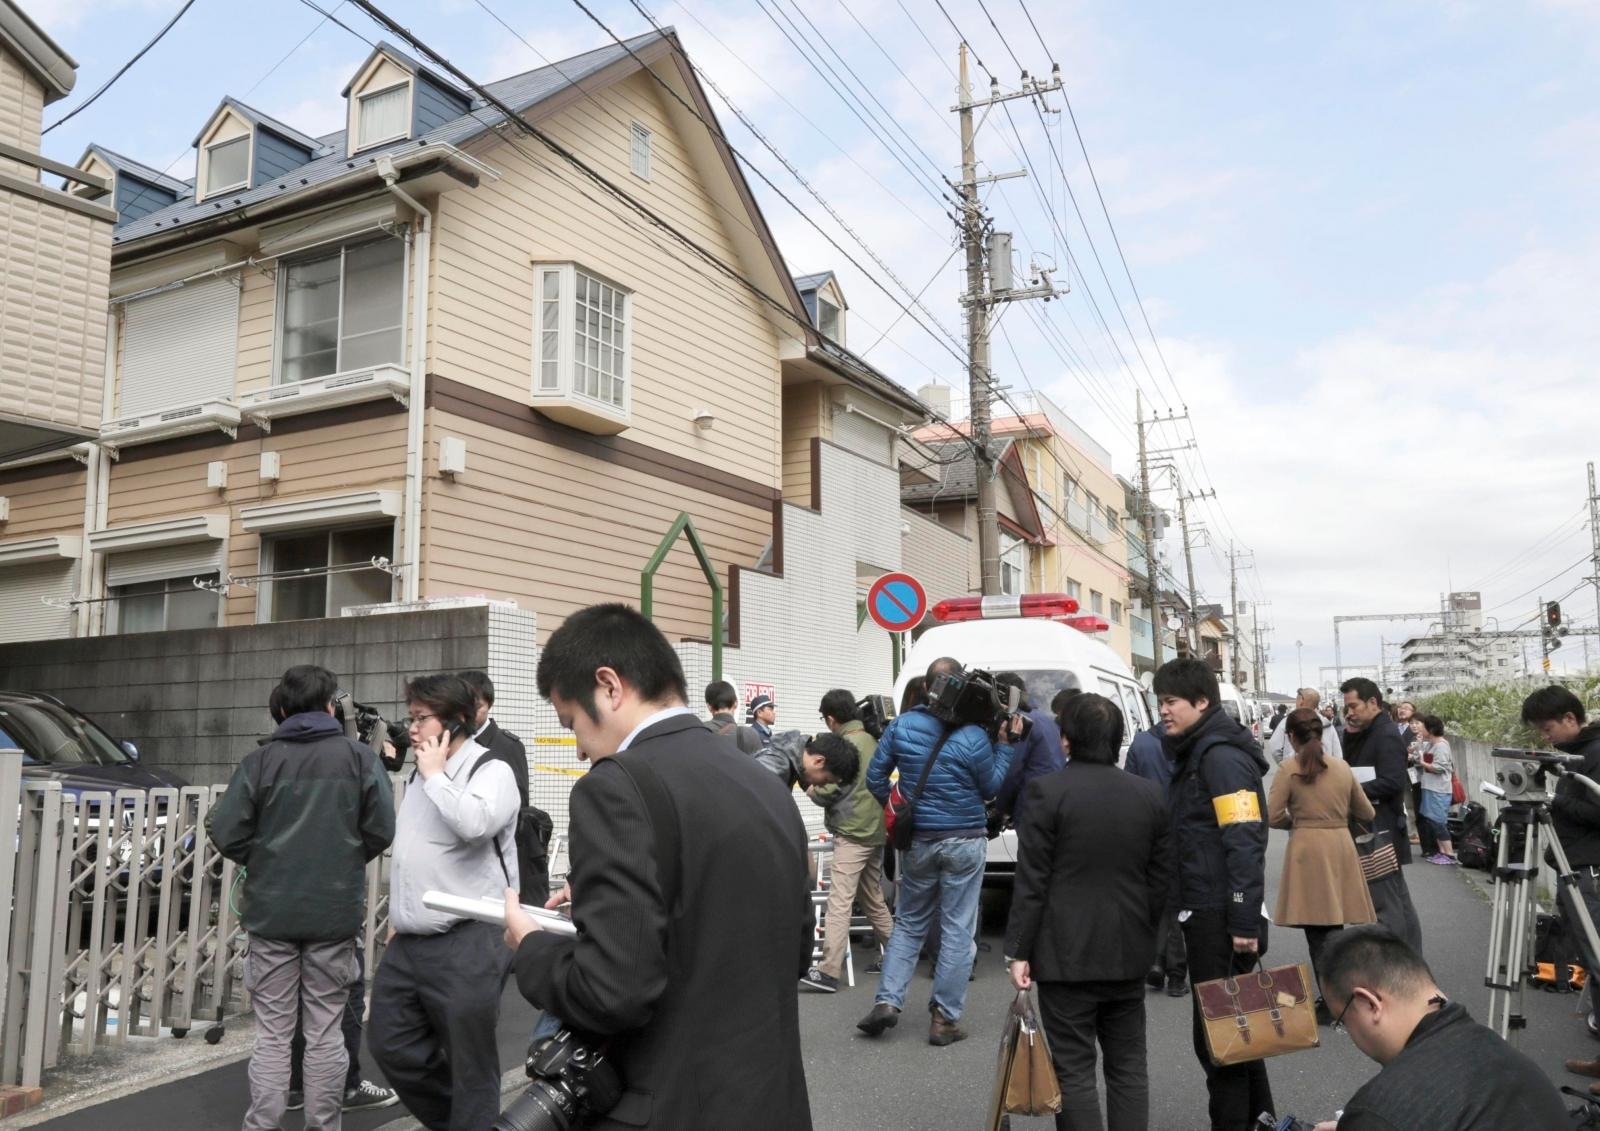 Japan apartment deaths